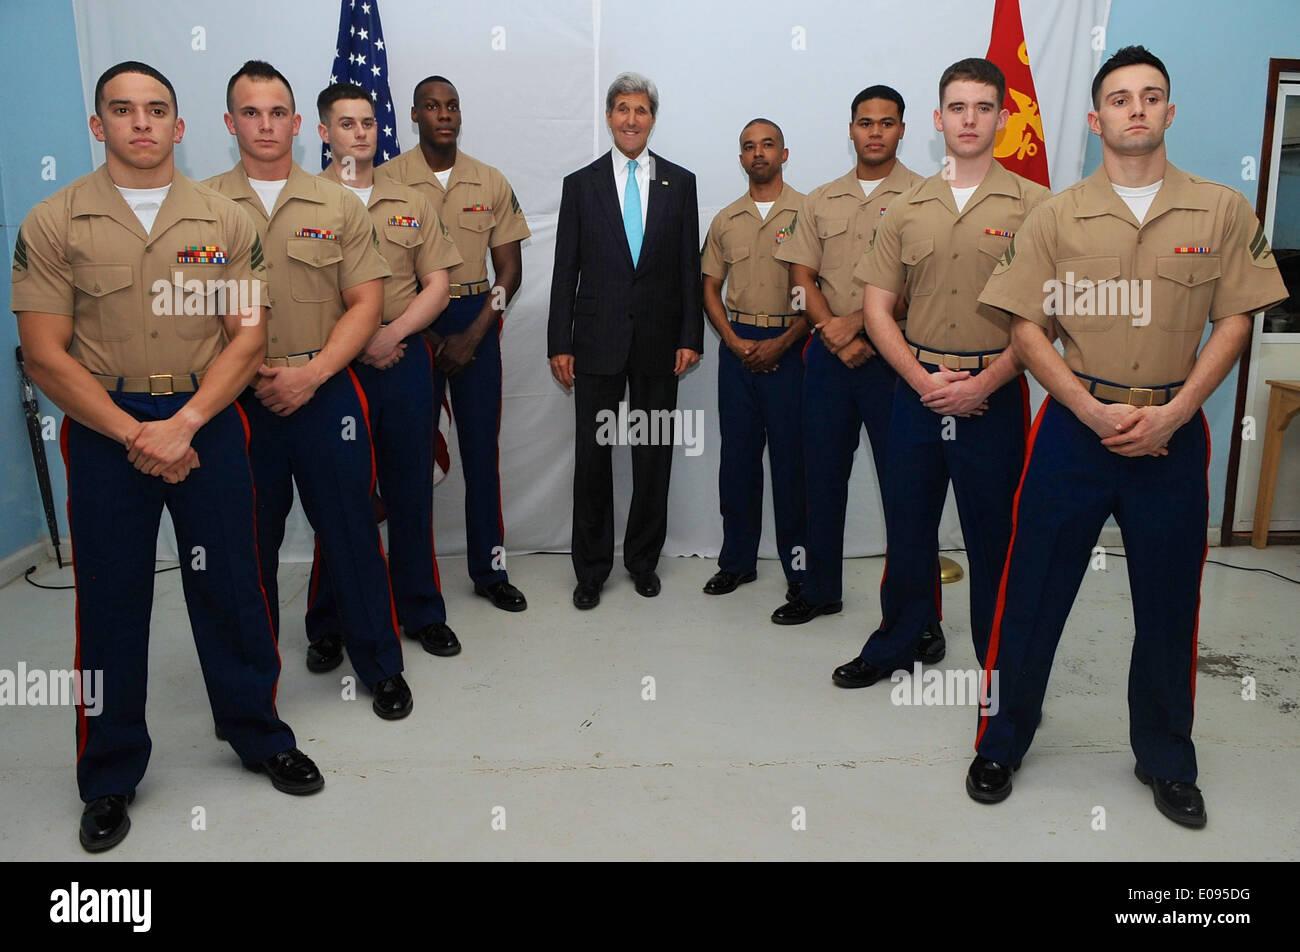 Secretary Kerry Poses With Marines Stationed at Embassy Juba - Stock Image